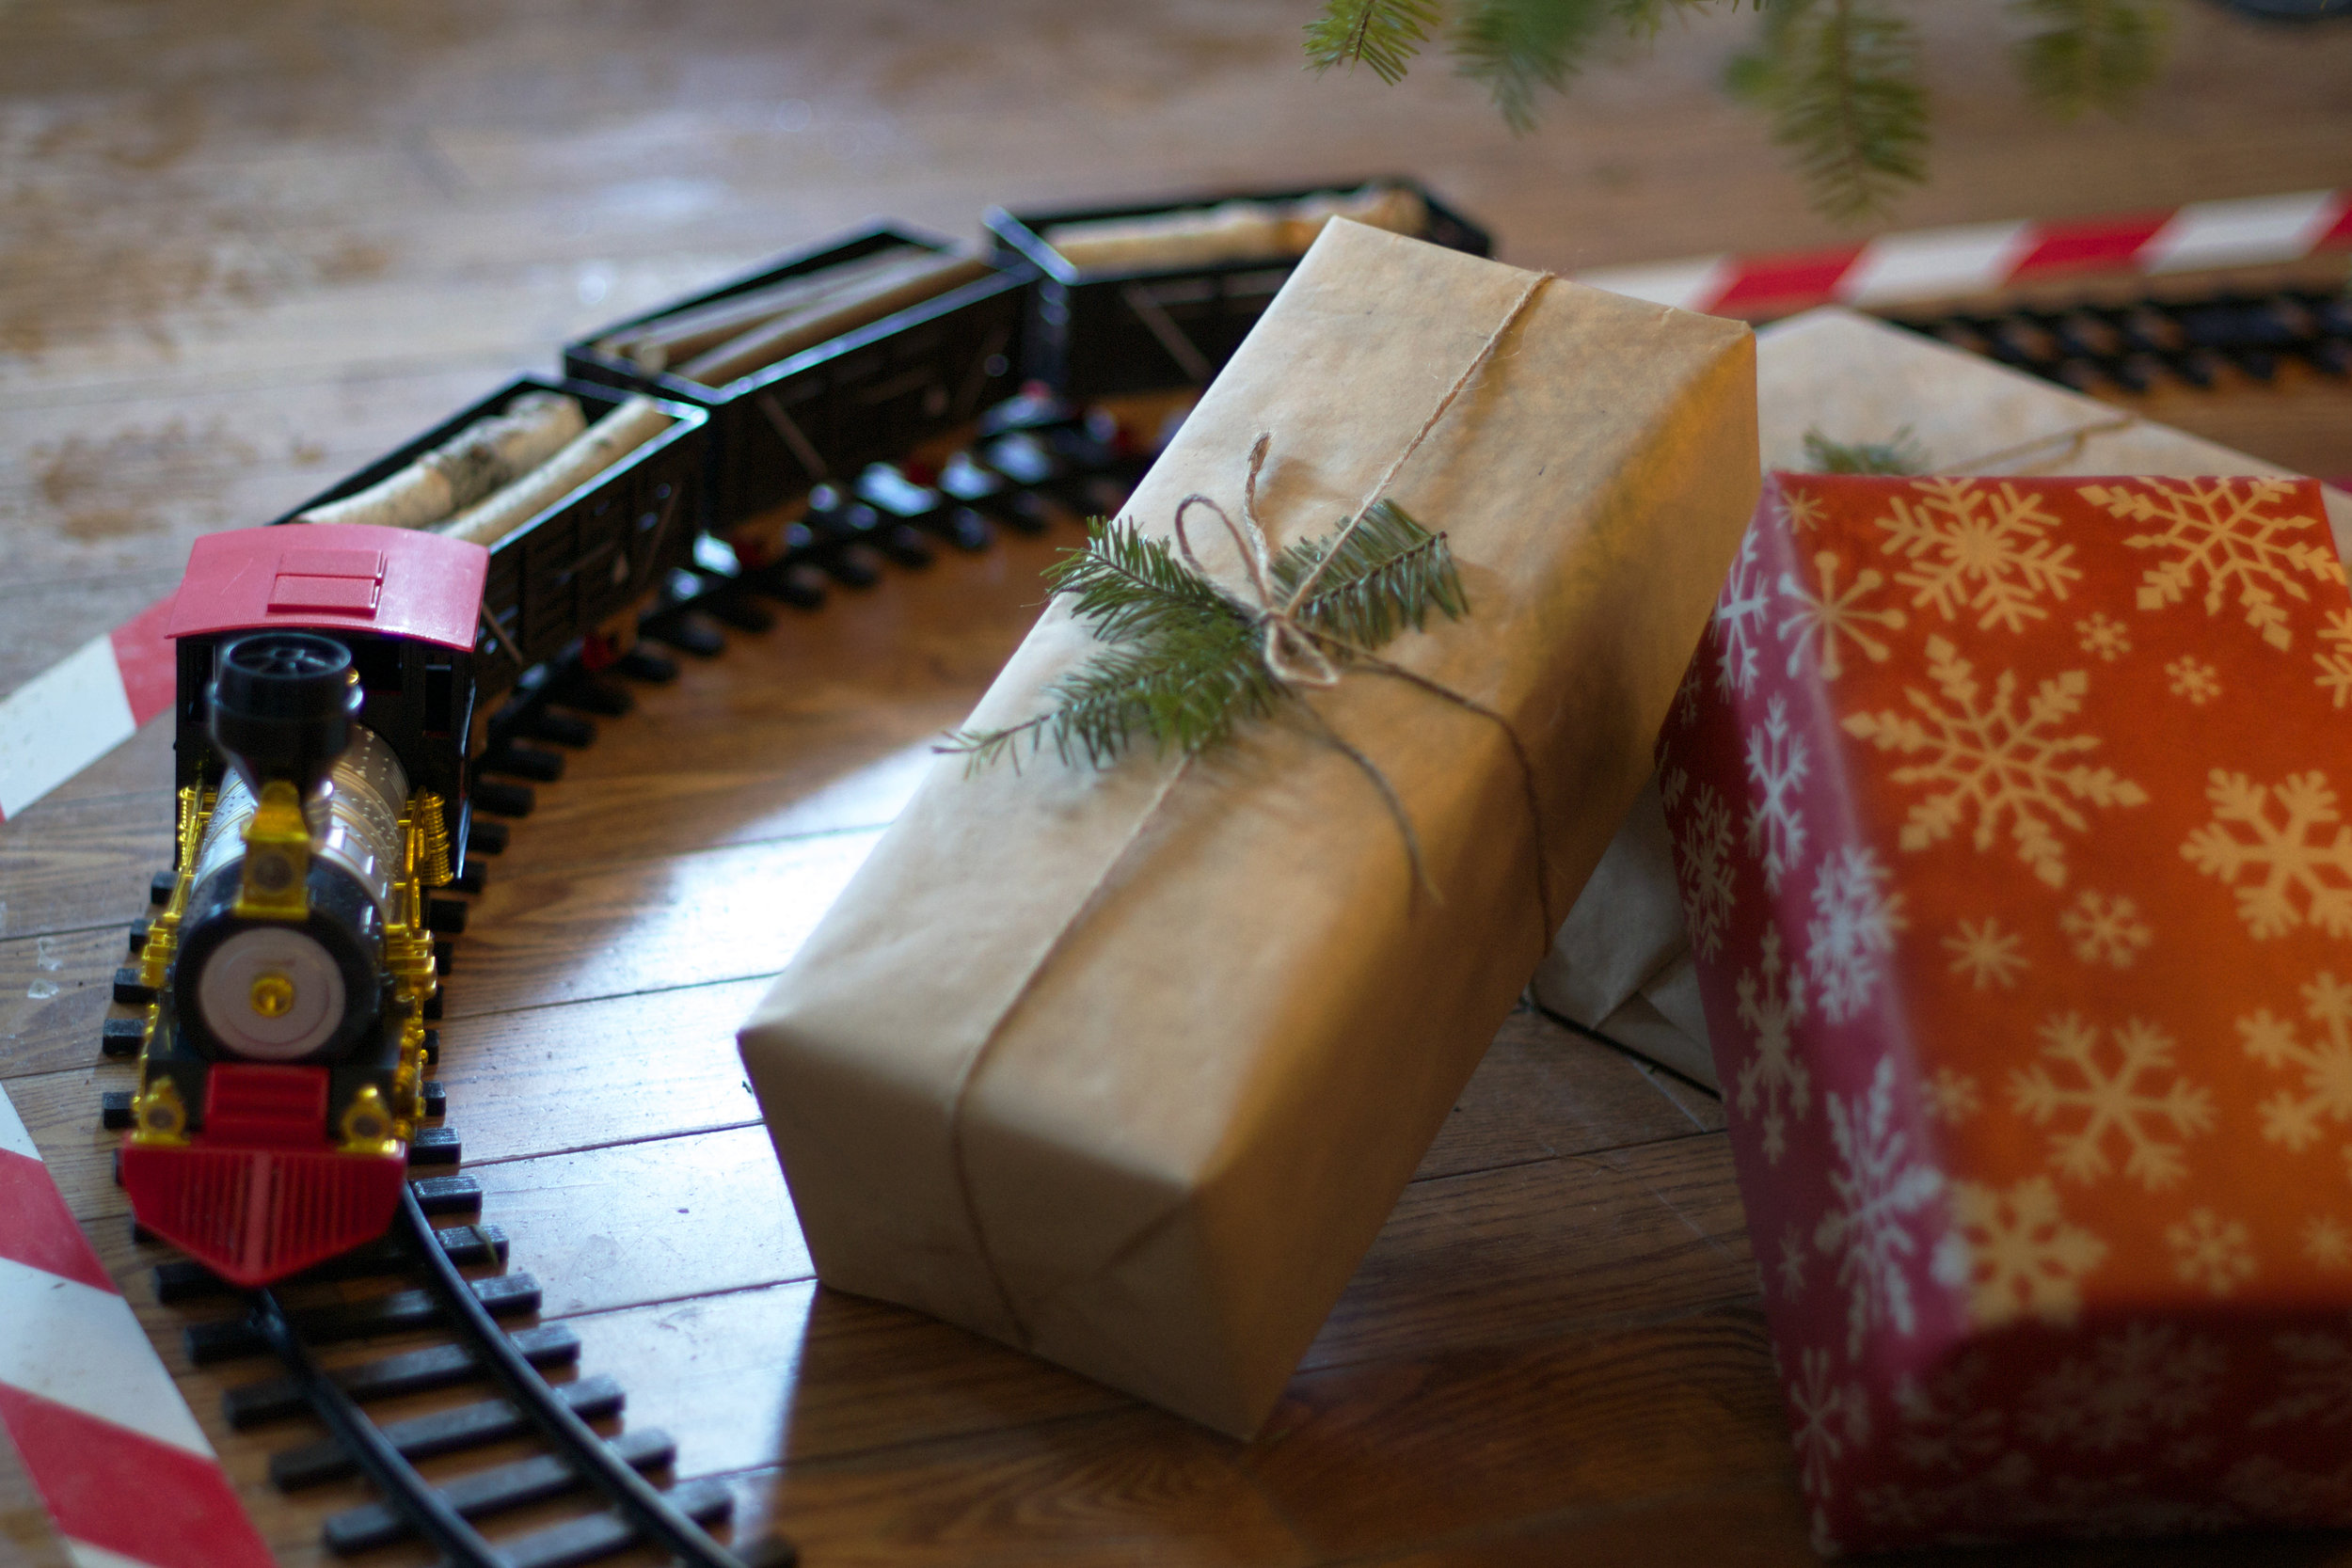 train-under-tree-with-presents.jpg